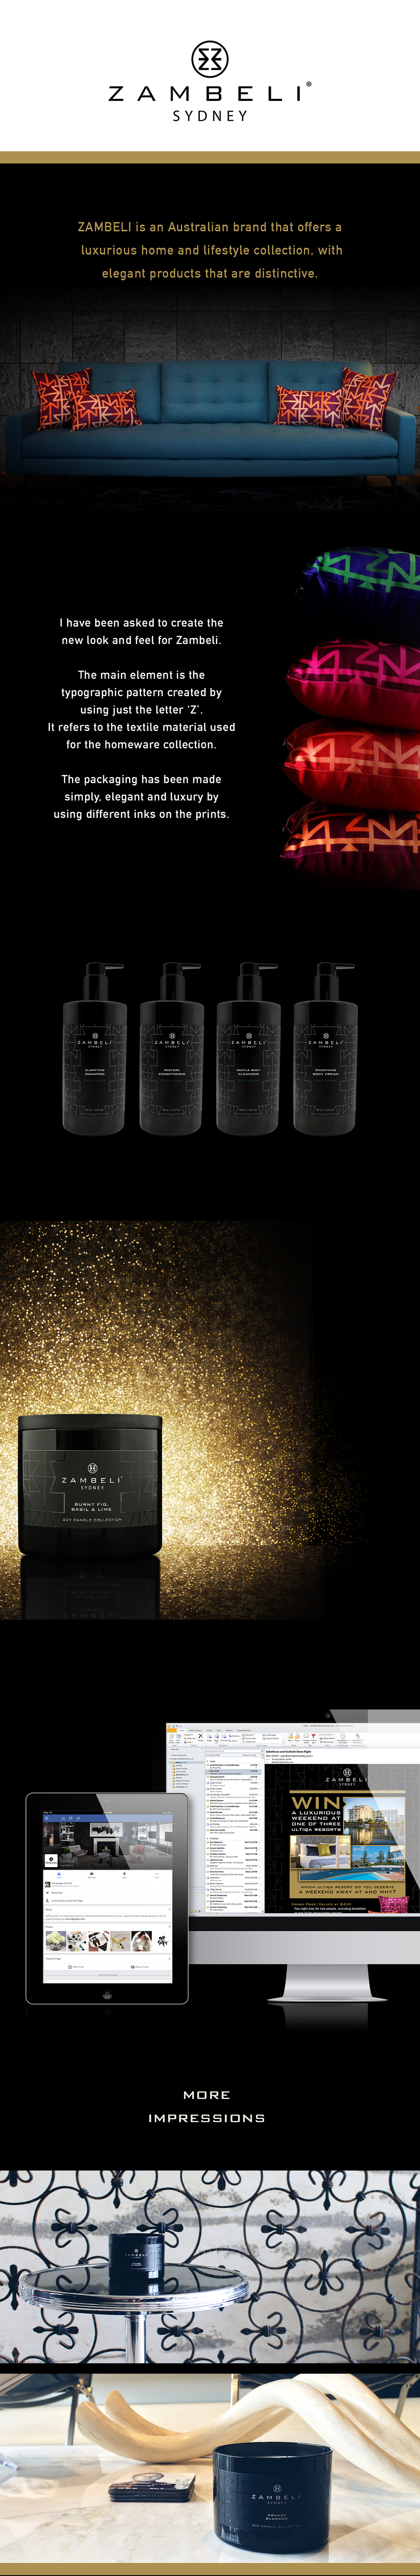 lifestyle home products skincare haircare pattern elegant luxury gold edm Invitation intern